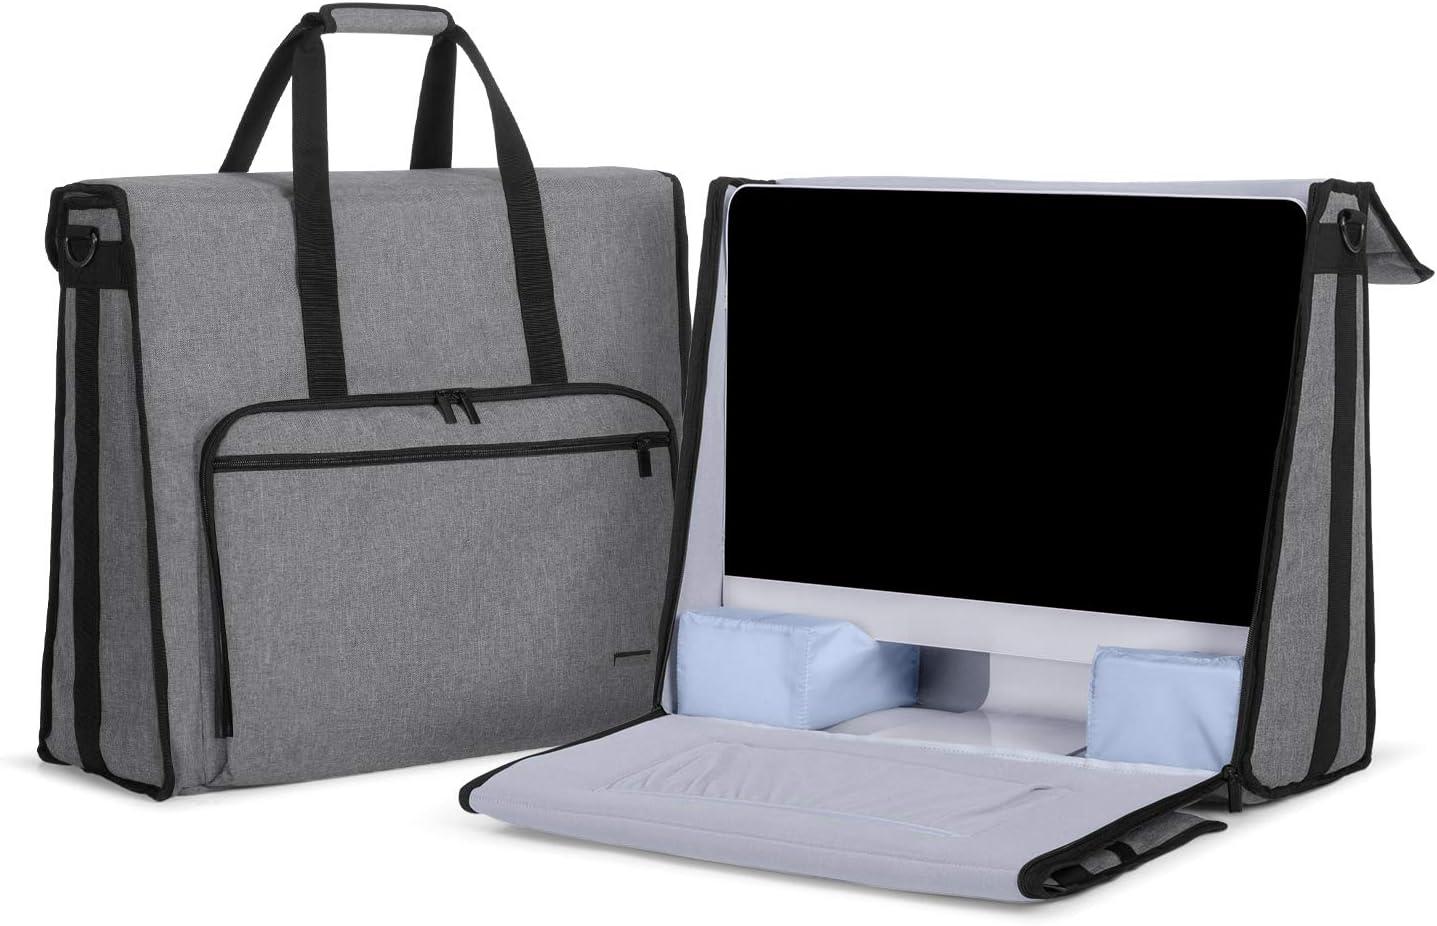 Sac iMac 21 pouces